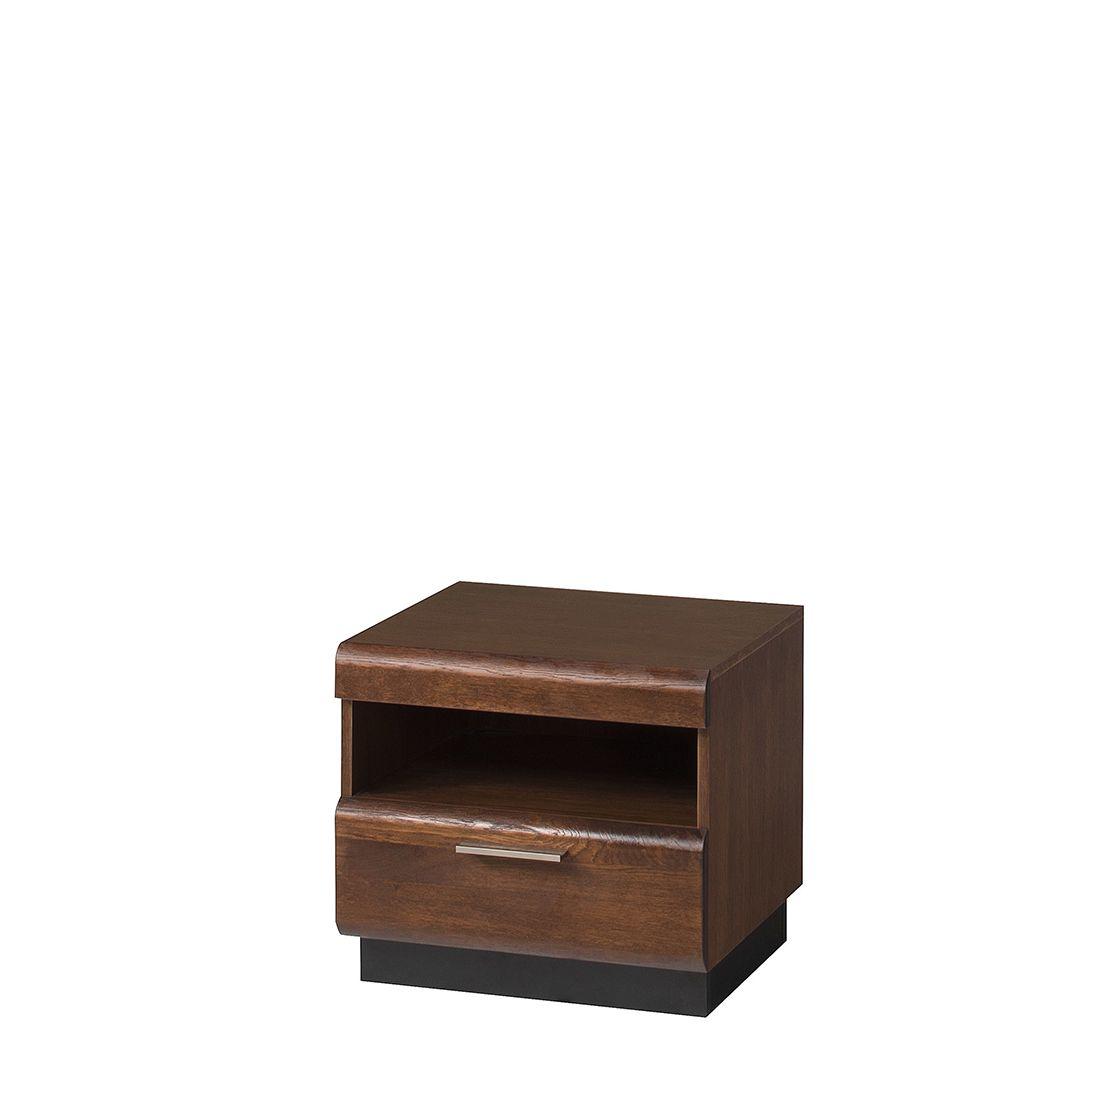 Нощно шкафче, колекция Porti